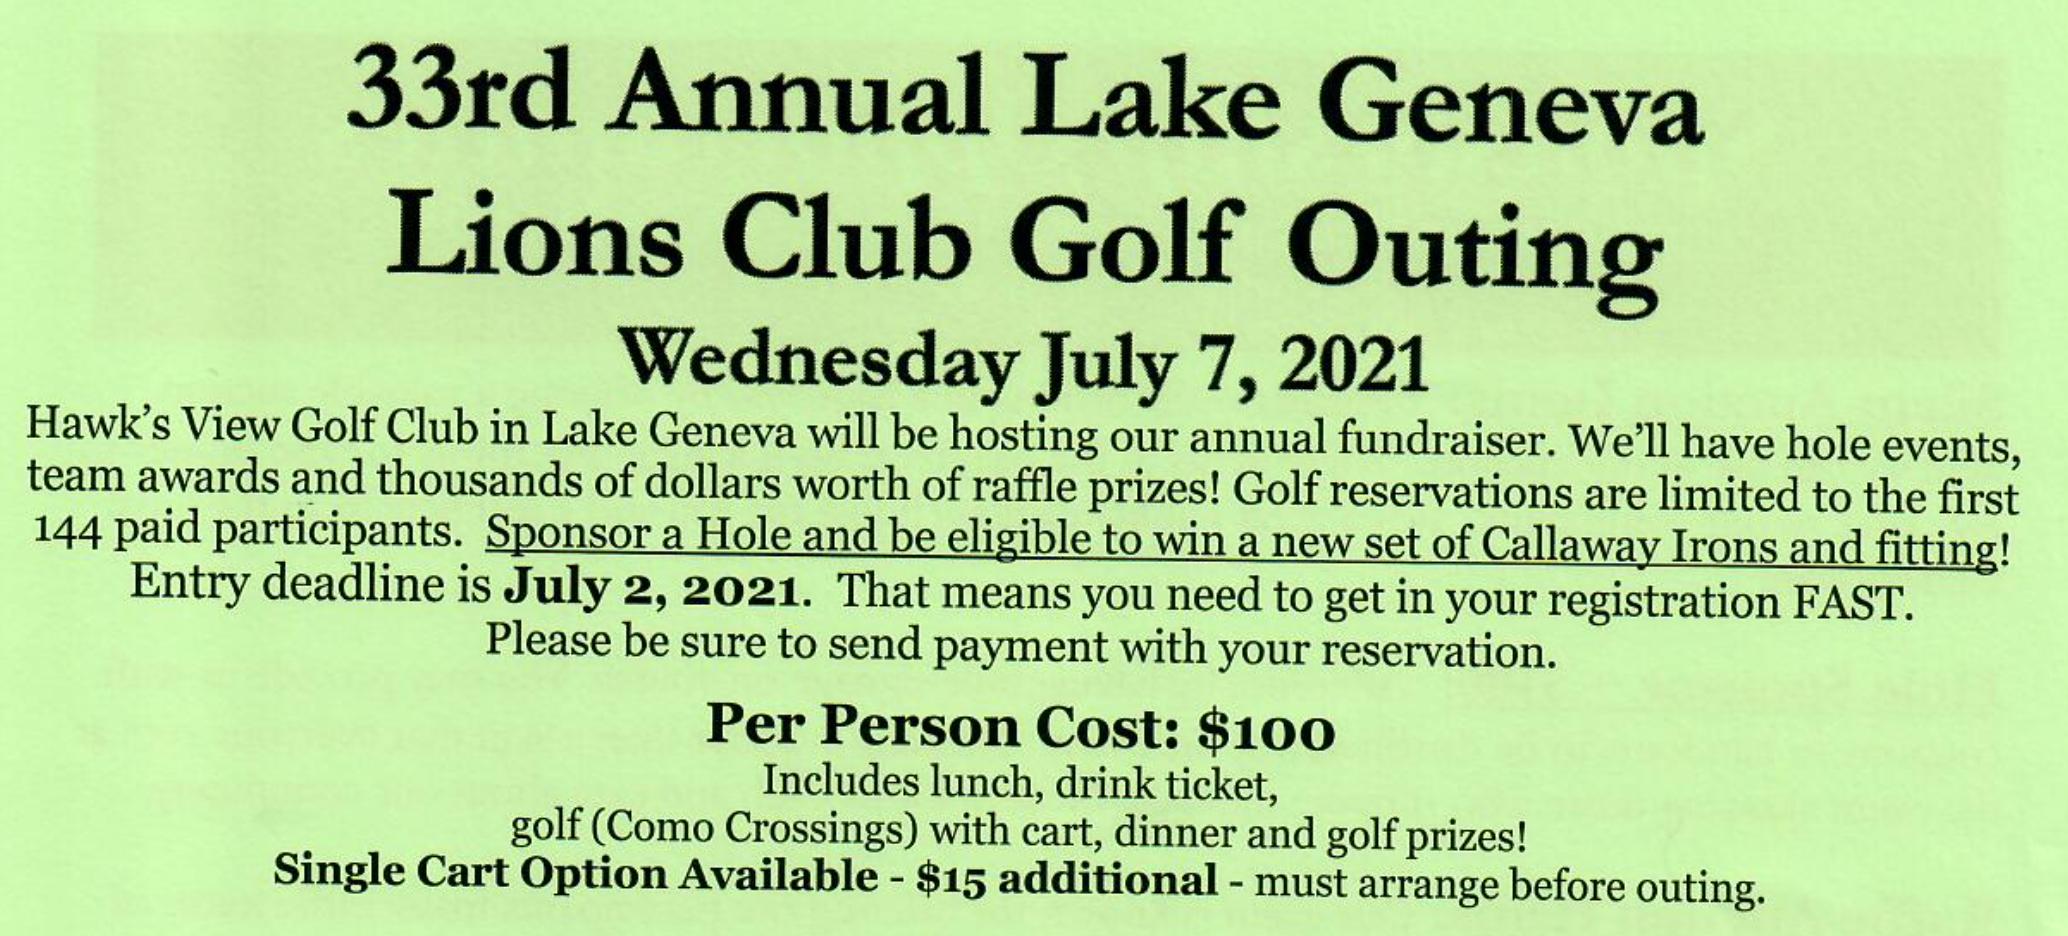 33rd Annual Lake Geneva Lions Golf Outing